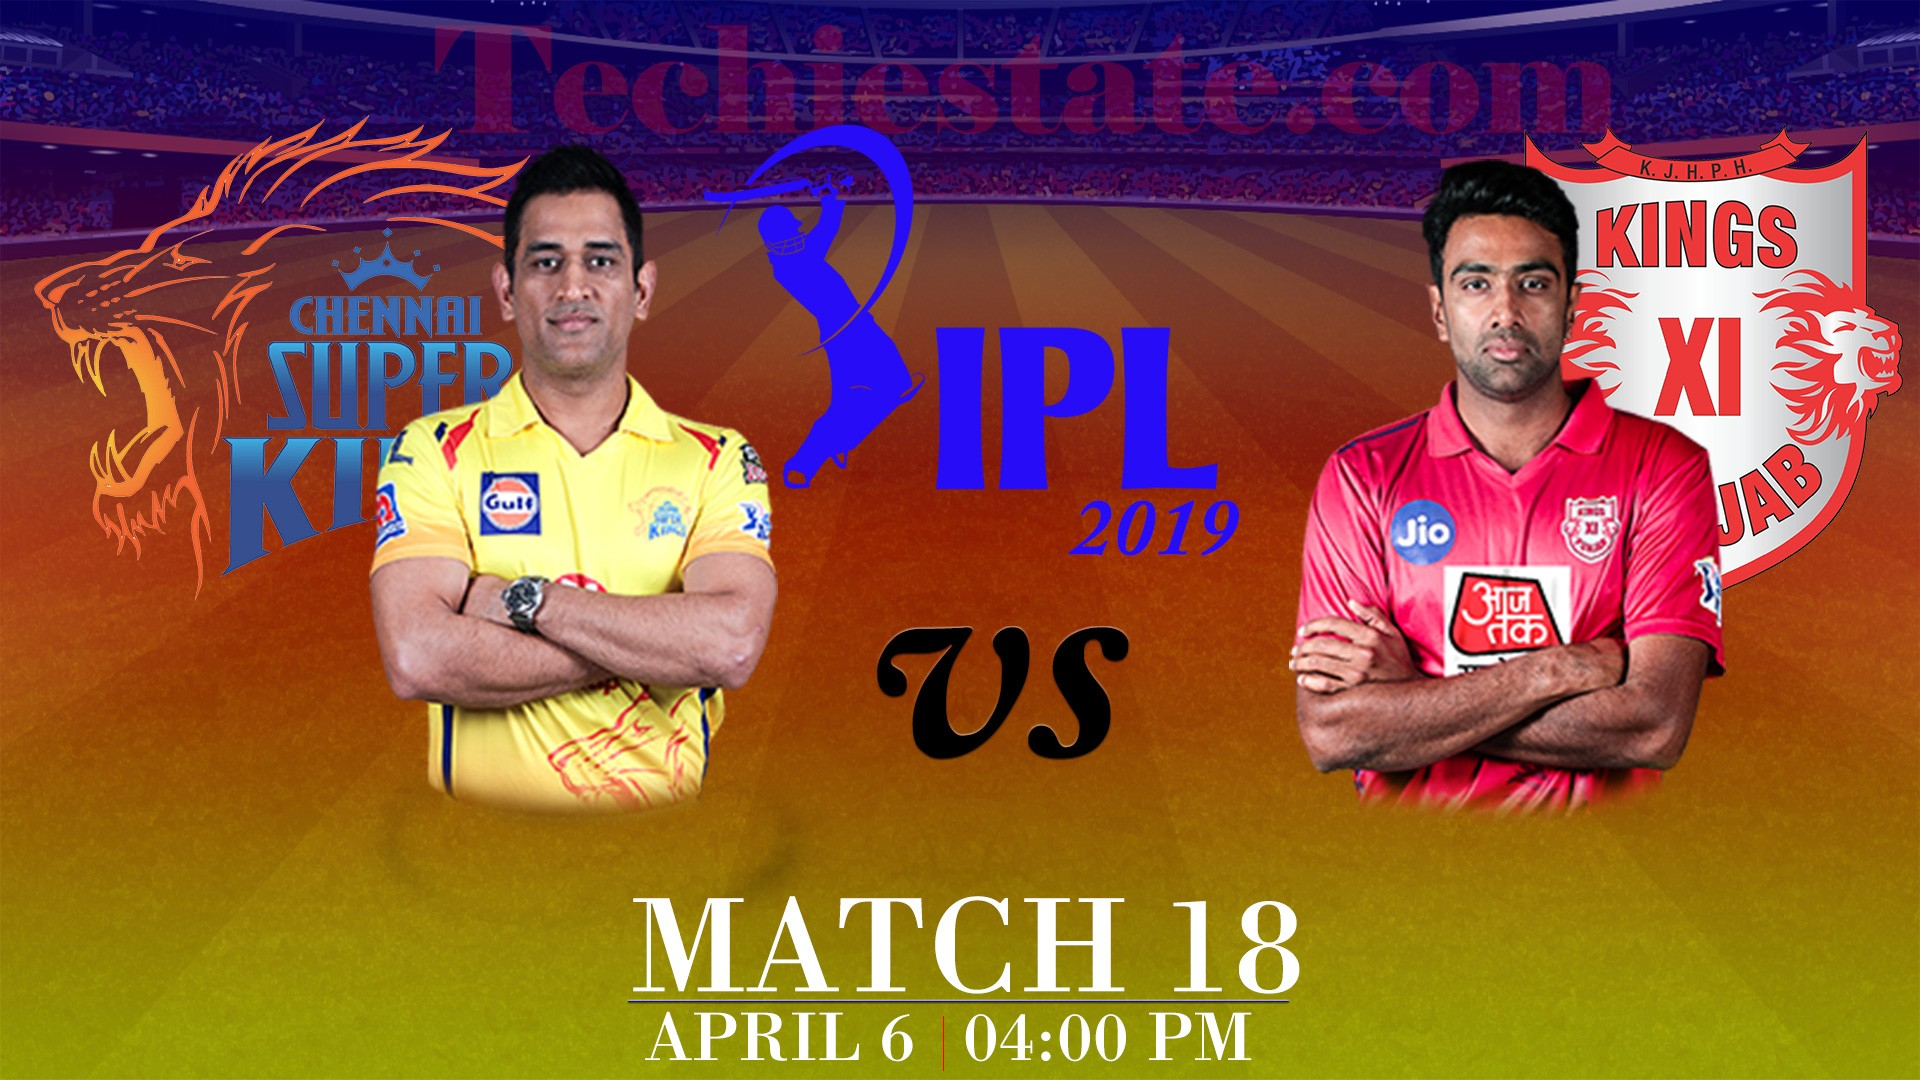 CSK Vs KXIP Match Prediction, Live Cricket Scores & Latest Updates